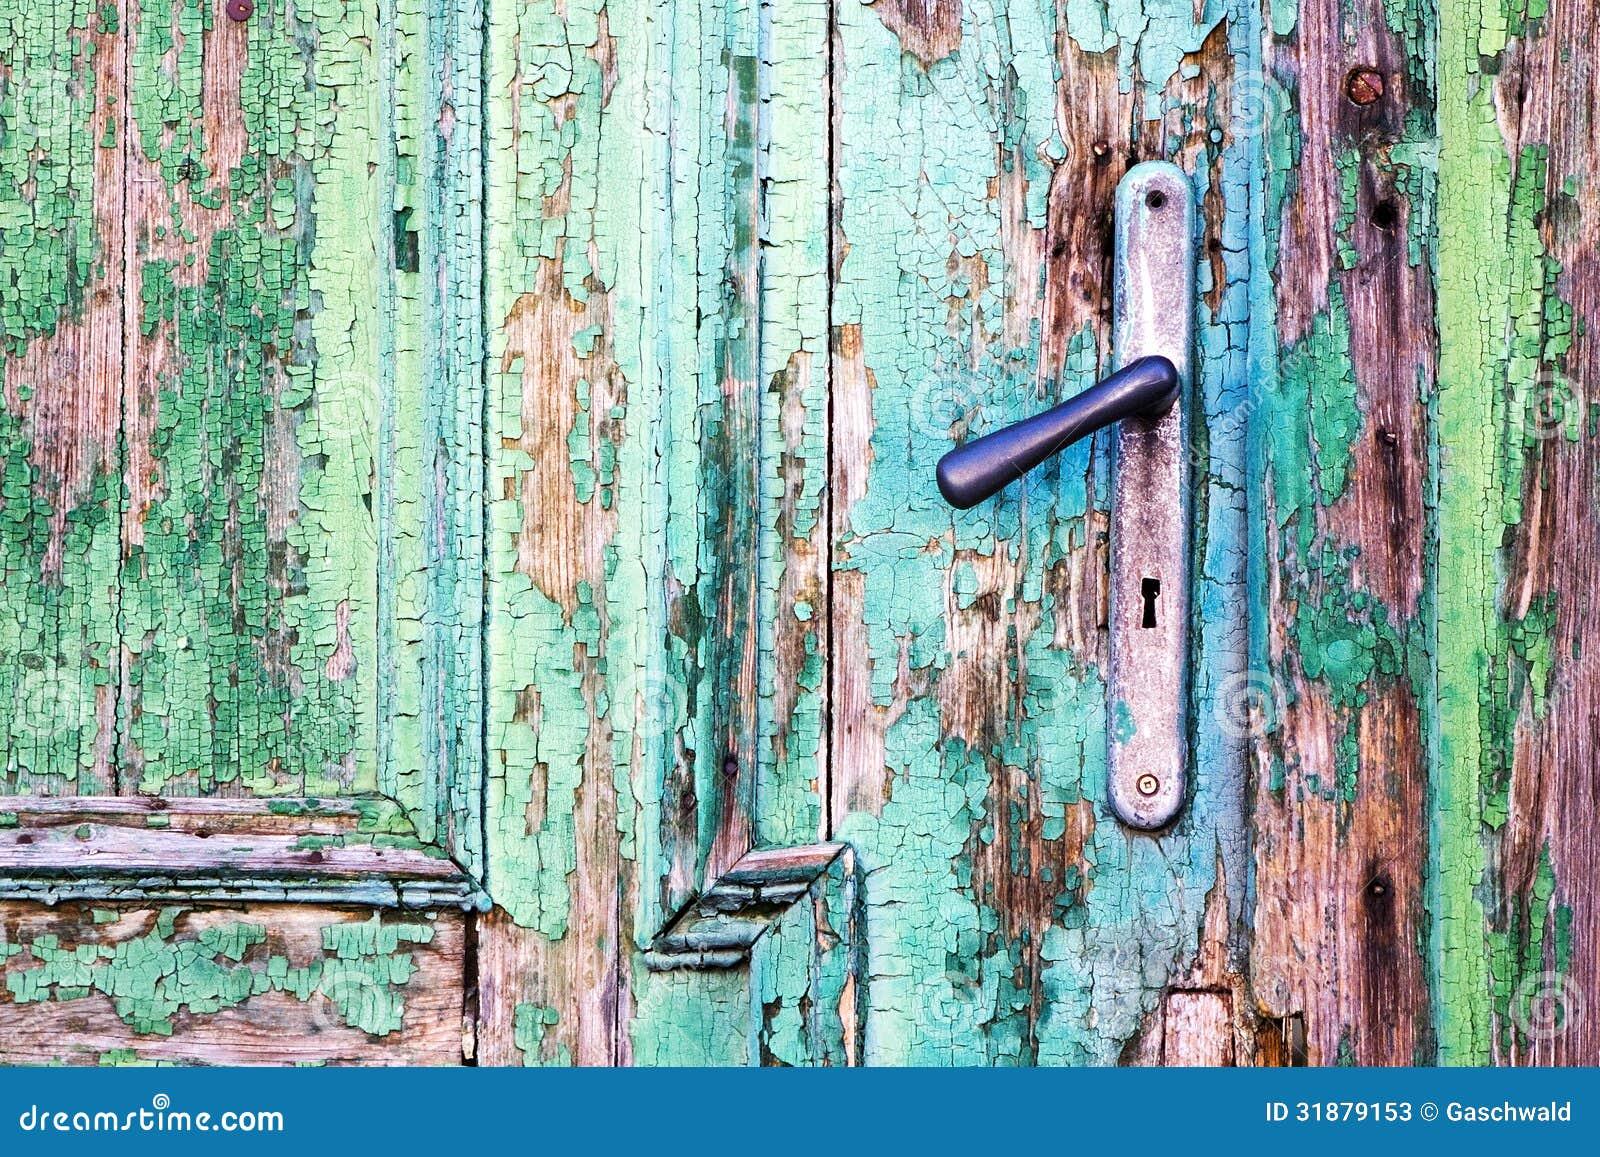 Manija en puerta de madera vieja fotos de archivo imagen for Puerta vieja madera